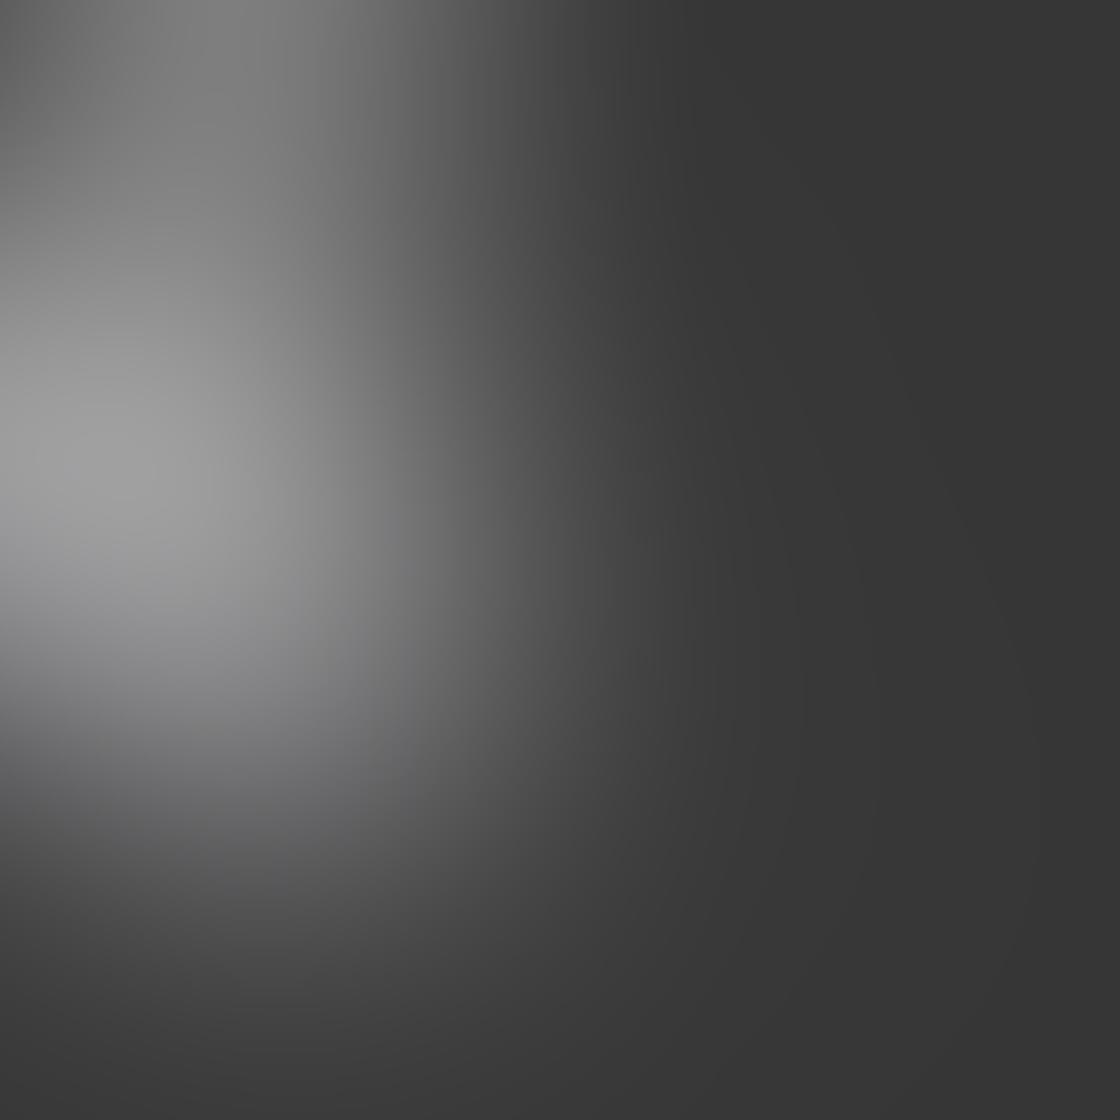 iPhone Photo Shadows 4